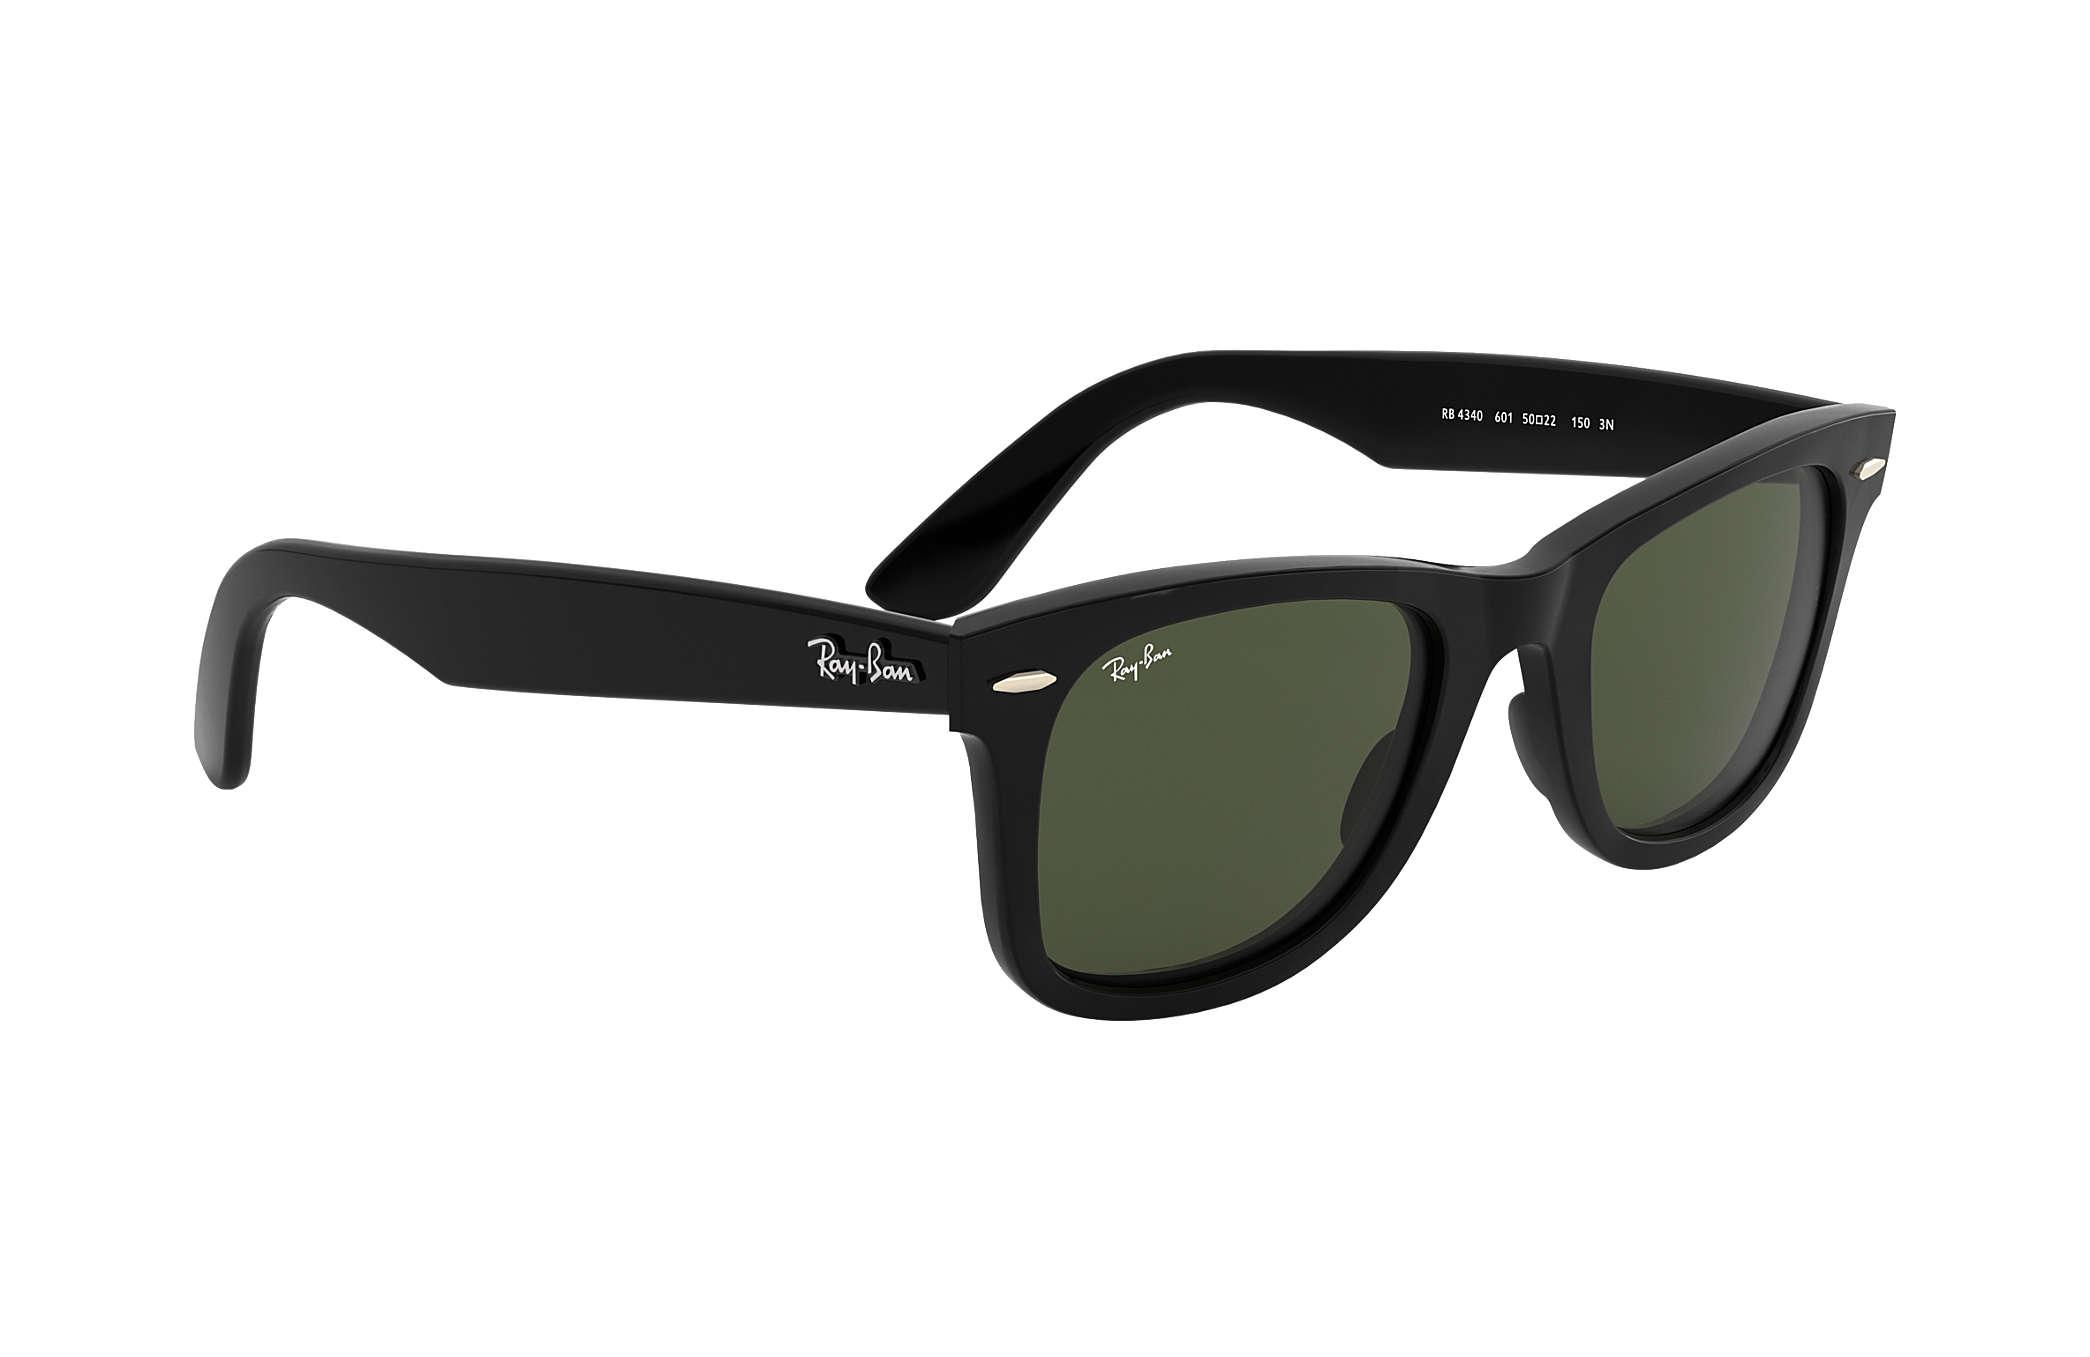 3277b98295 Ray-Ban Wayfarer Ease RB4340 Black - Injected - Green Lenses ...